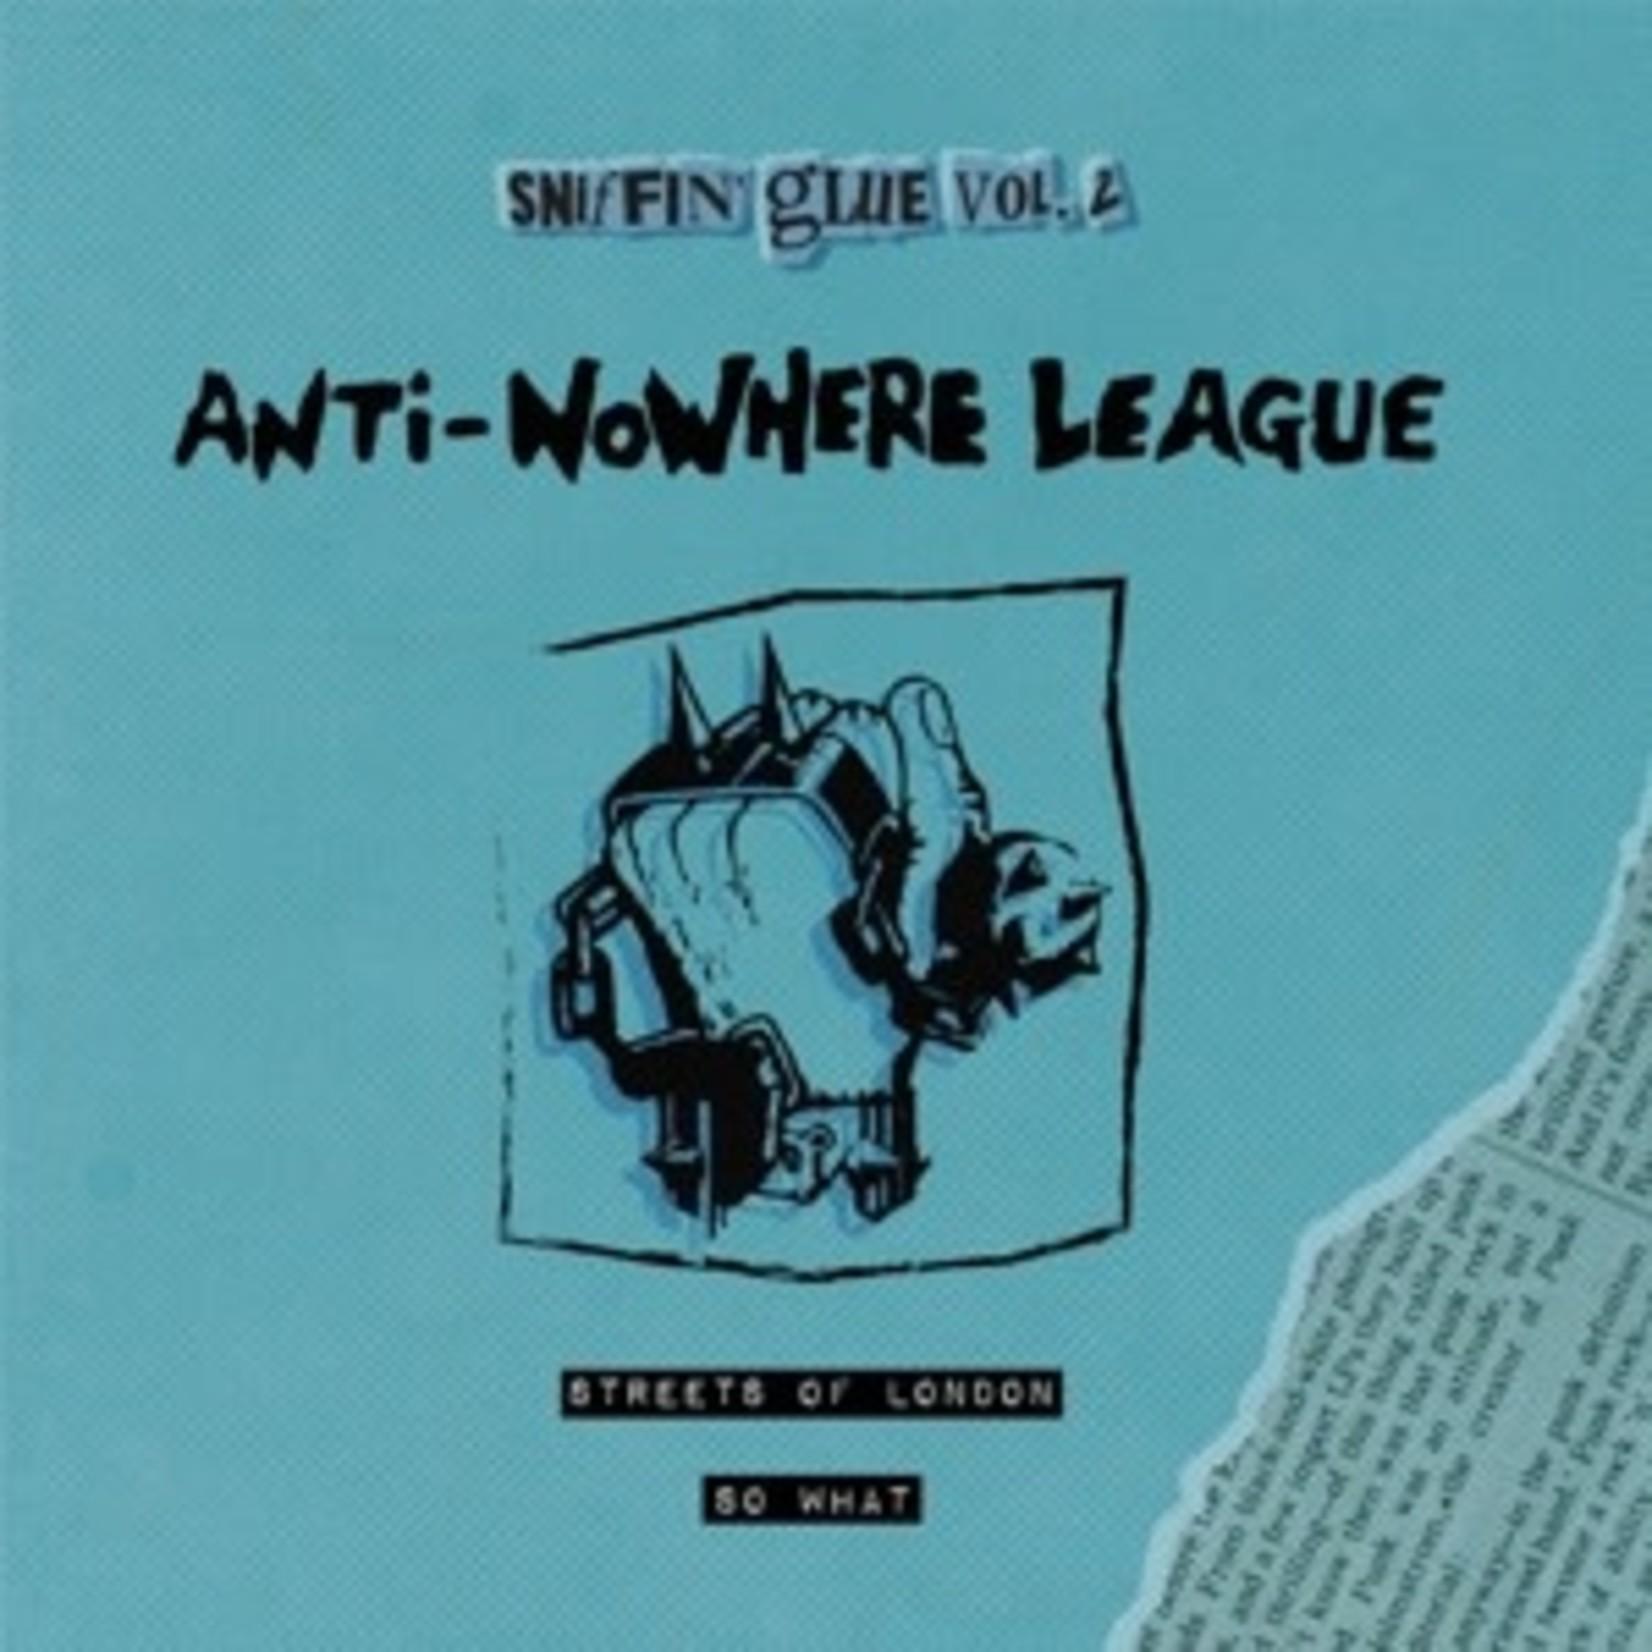 "ANTI NO-WHERE LEAGUE 7-STREETS OF LONDON (7"") op blauw vinyl"